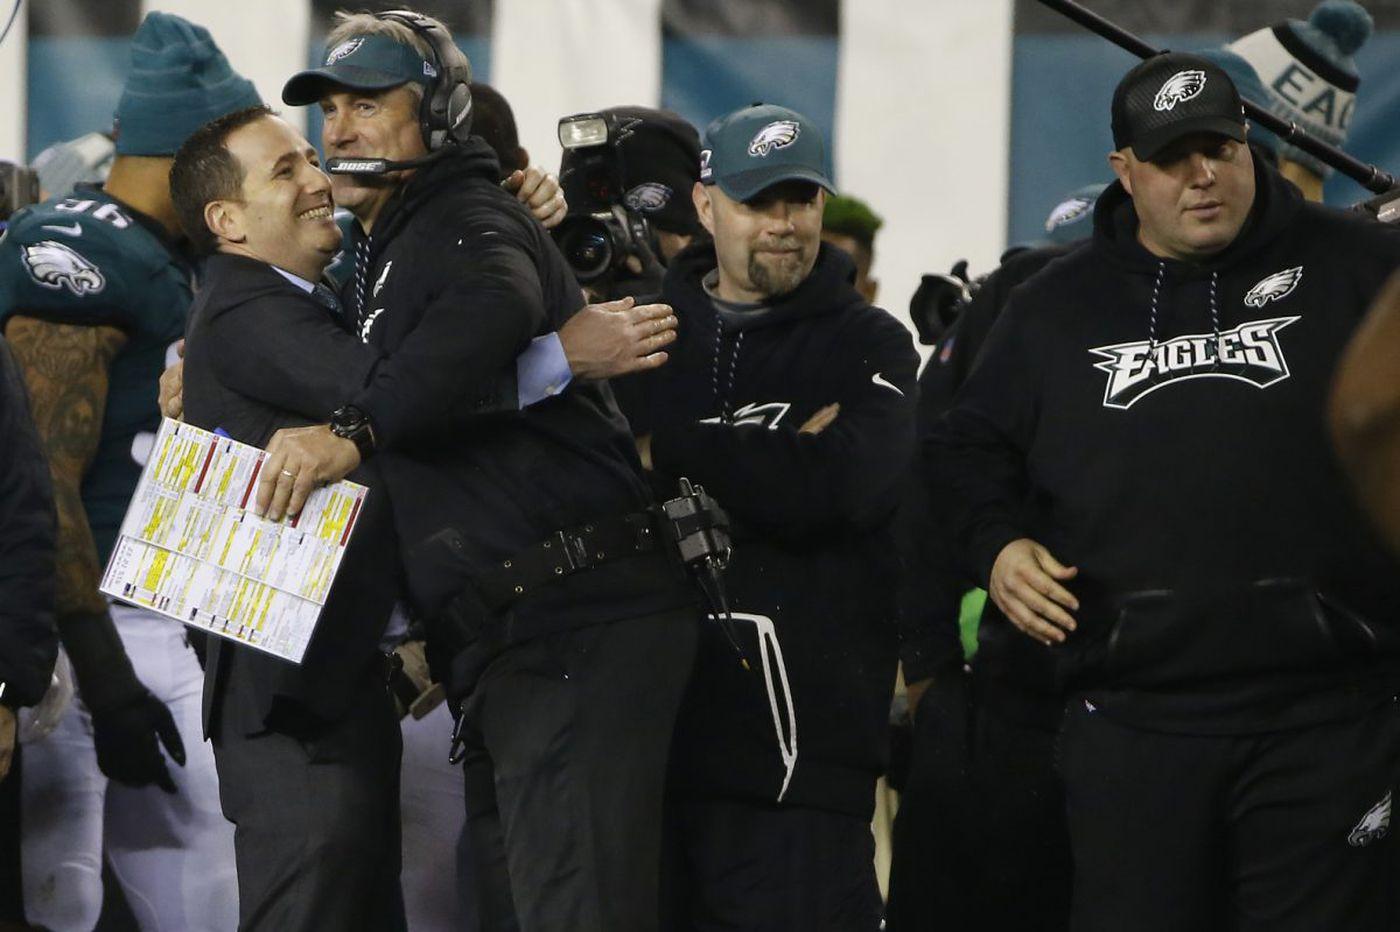 Howie Roseman's fingerprints all over Eagles' NFC championship win, Super Bowl berth | Jeff McLane